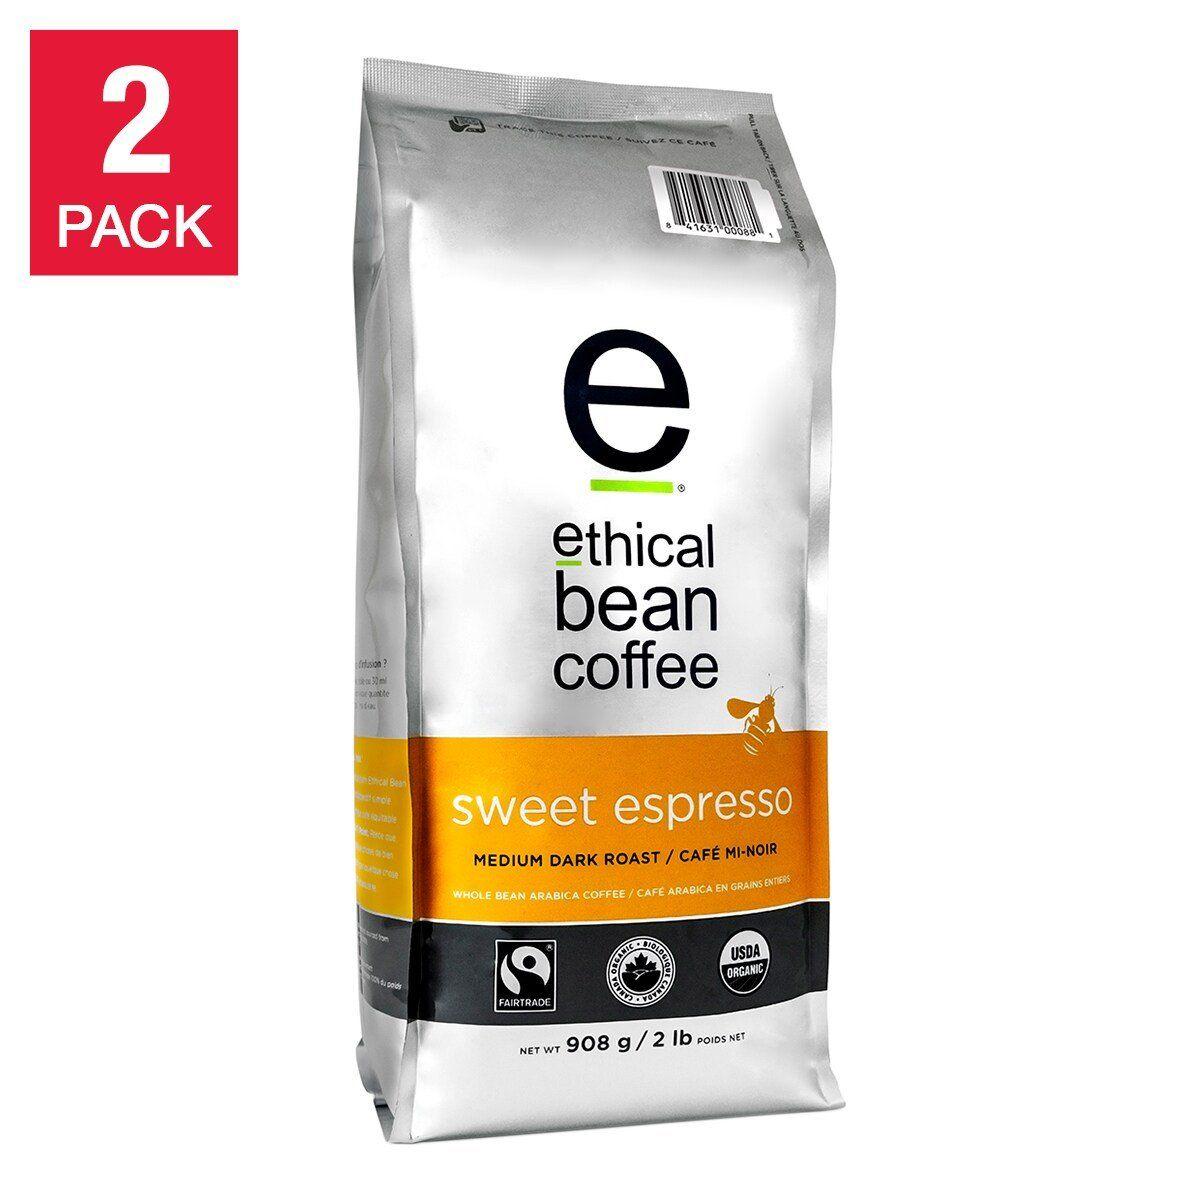 Ethical Bean Coffee Sweet Espresso Medium Dark Roast Whole Bean Coffee, 2-pack